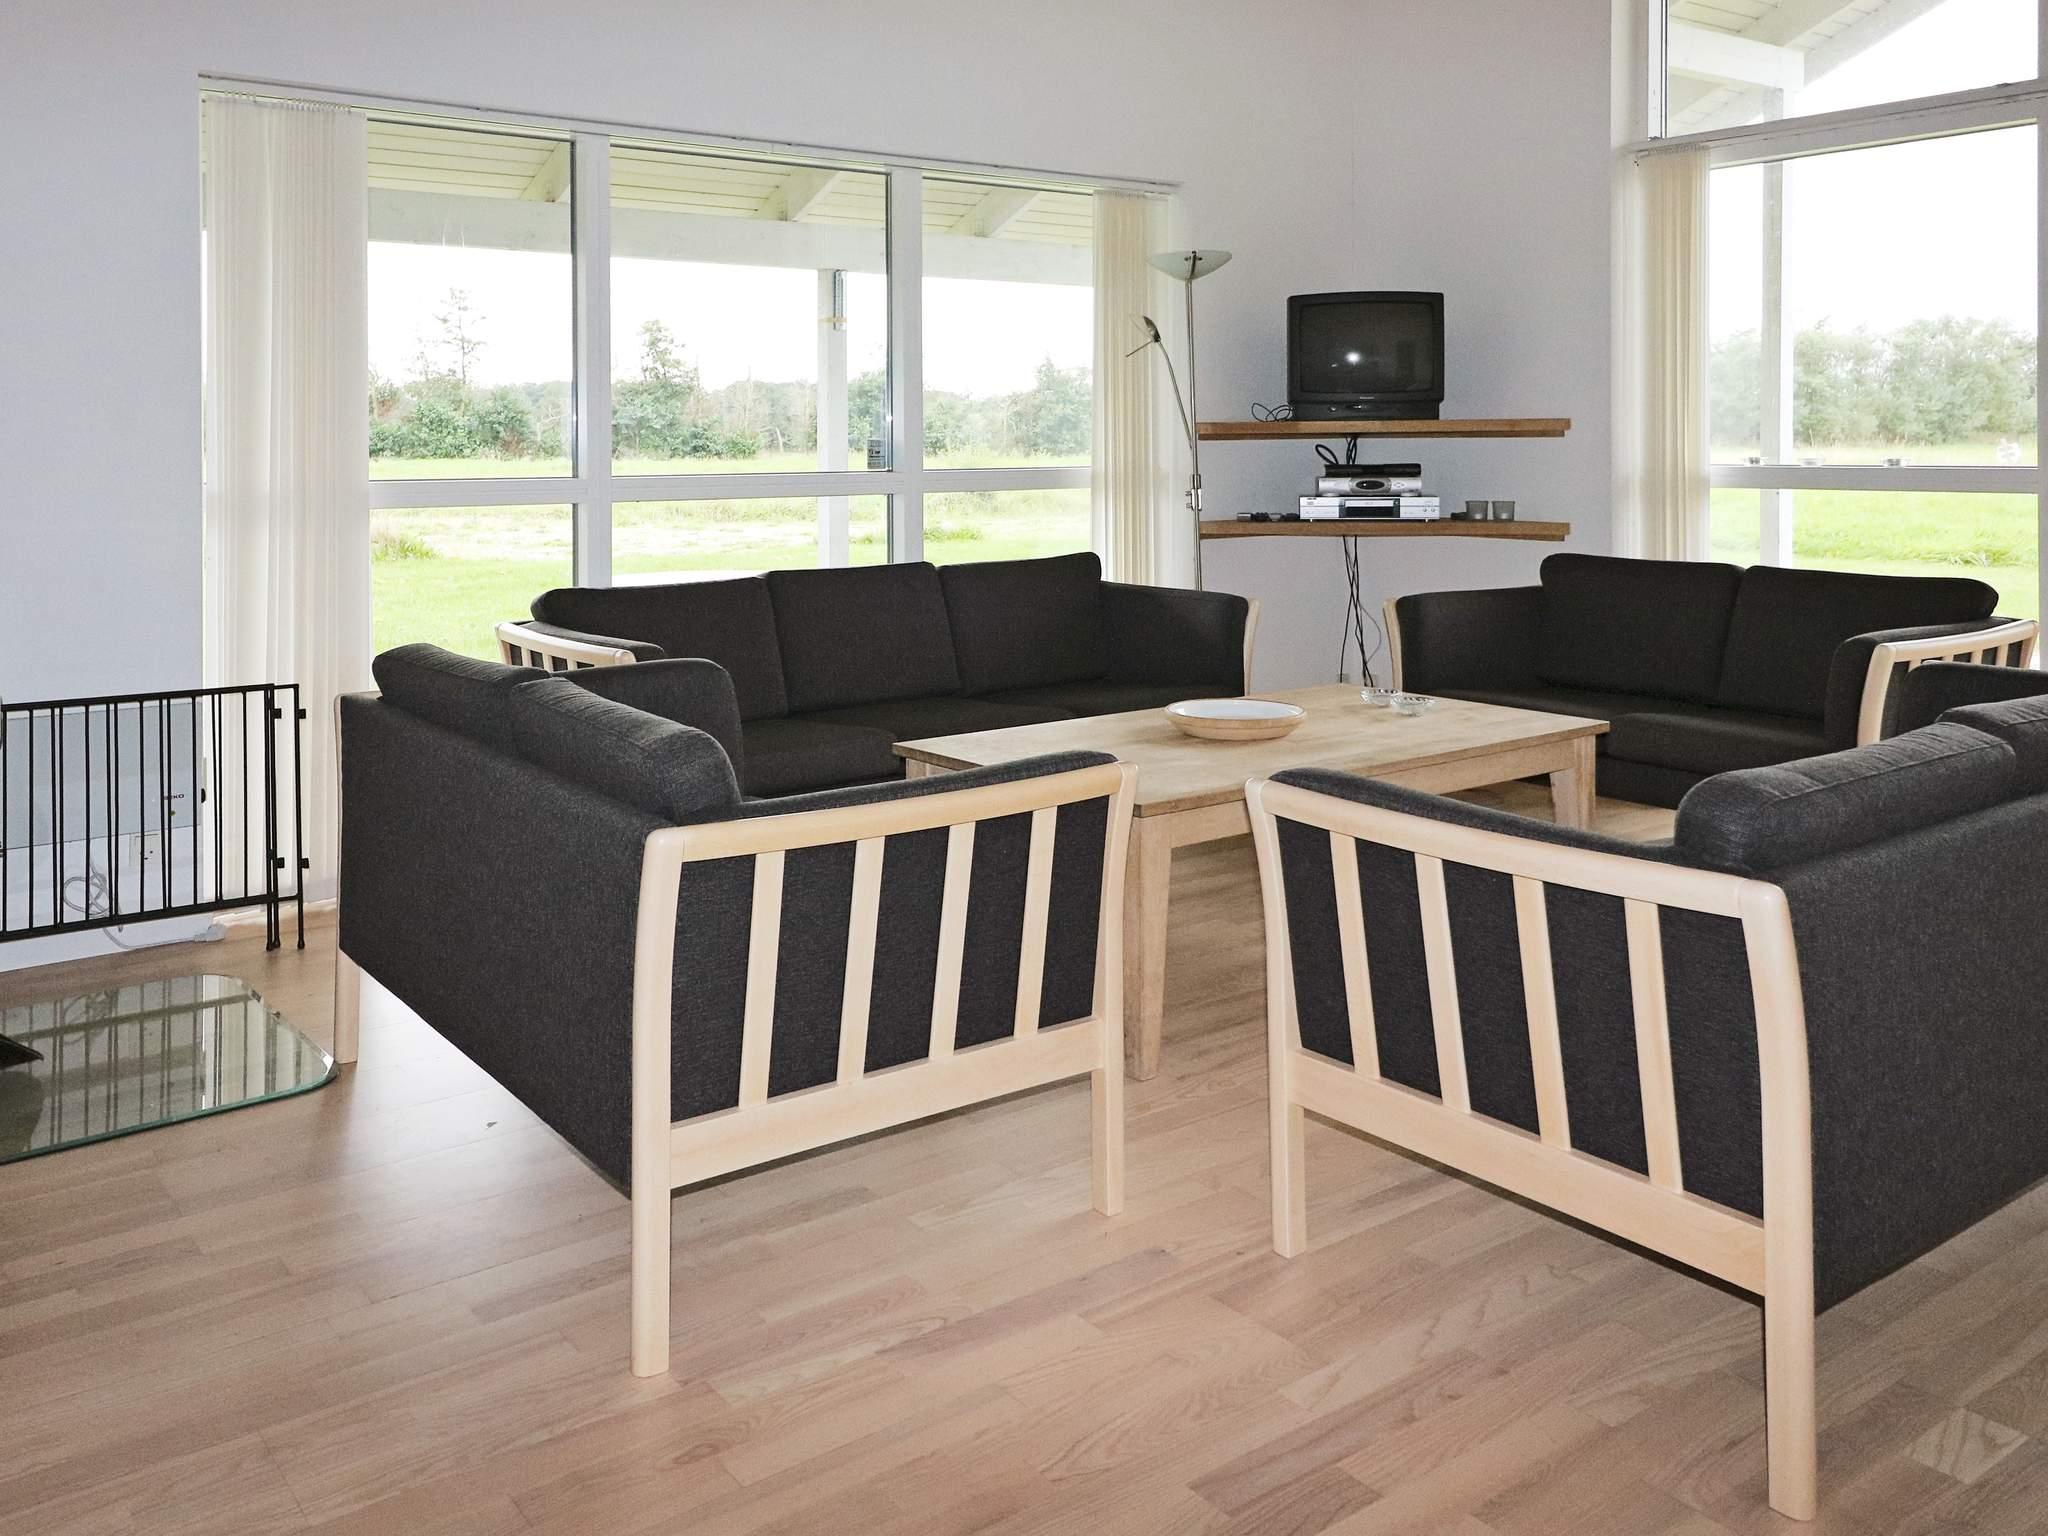 Ferienhaus Øster Hurup (681777), Øster Hurup, , Ostjütland, Dänemark, Bild 3